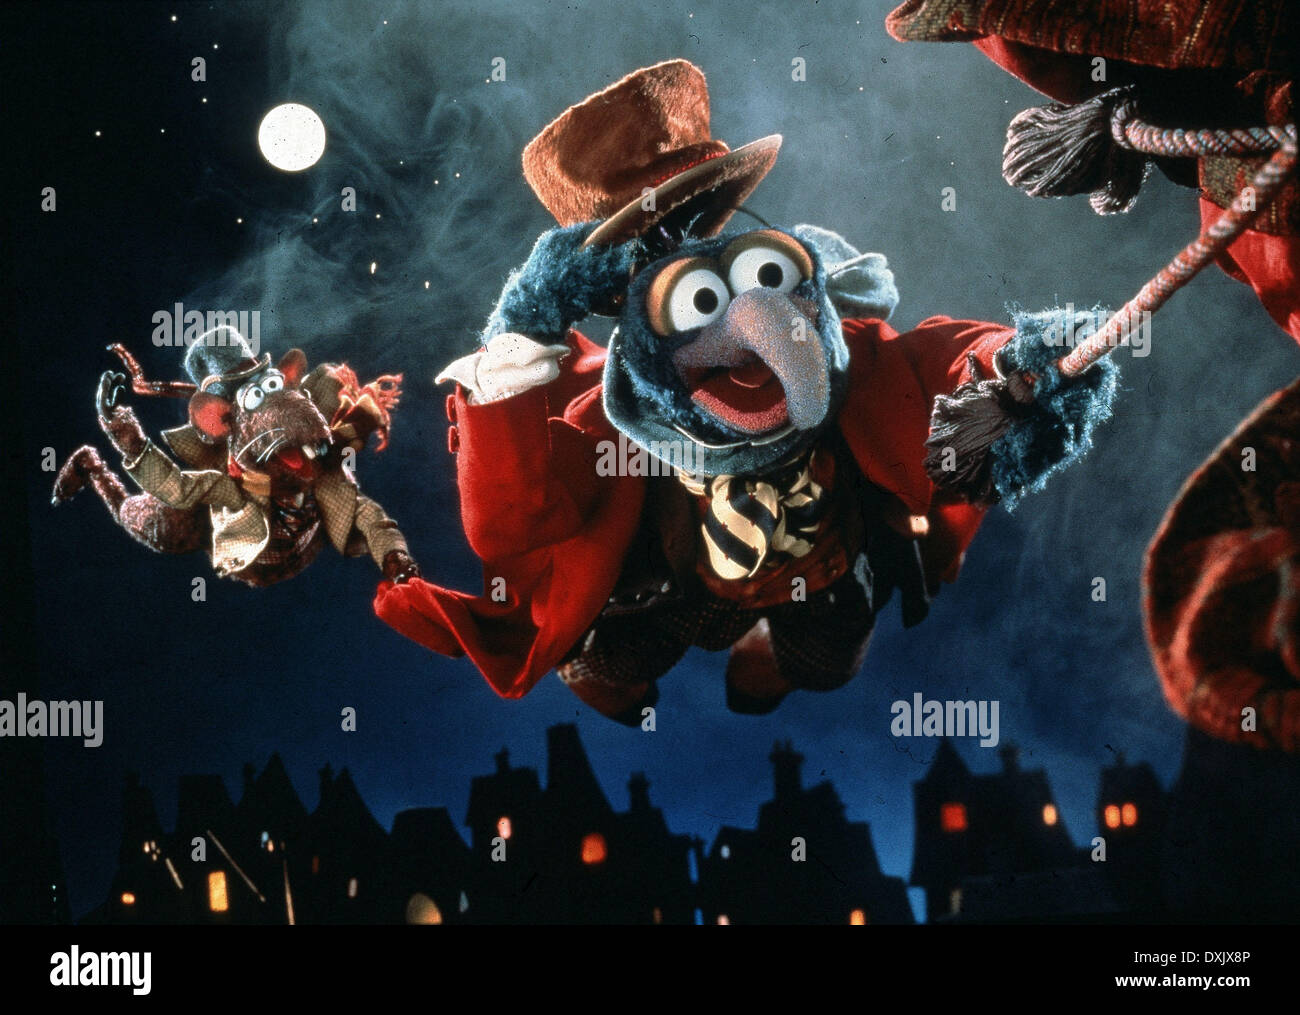 Muppet Stockfotos & Muppet Bilder - Alamy